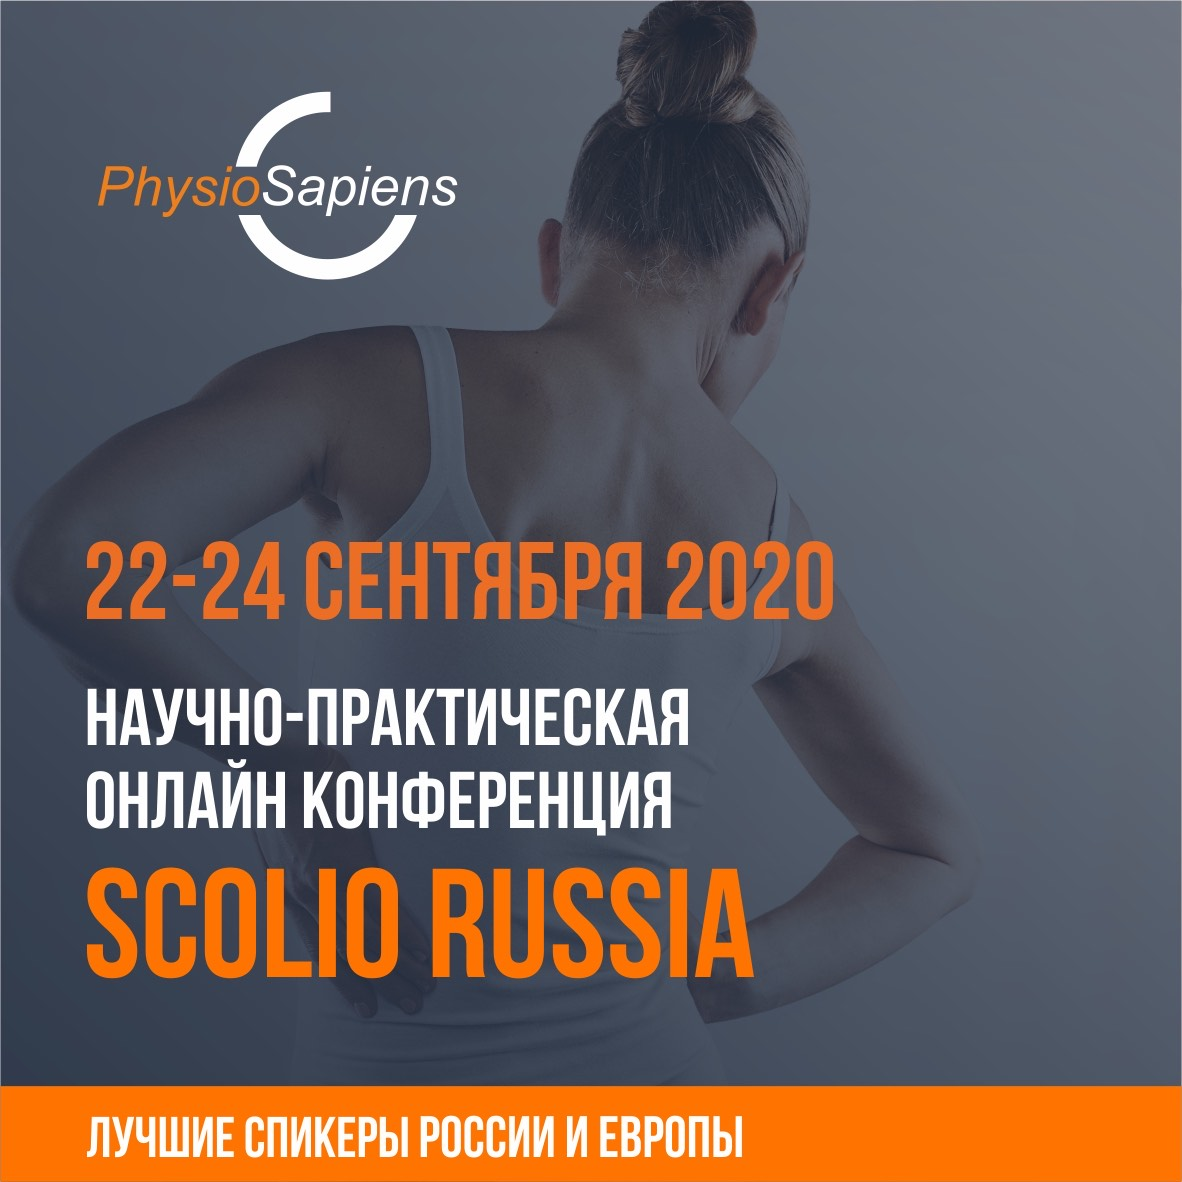 Конференция «Scolio Russia»